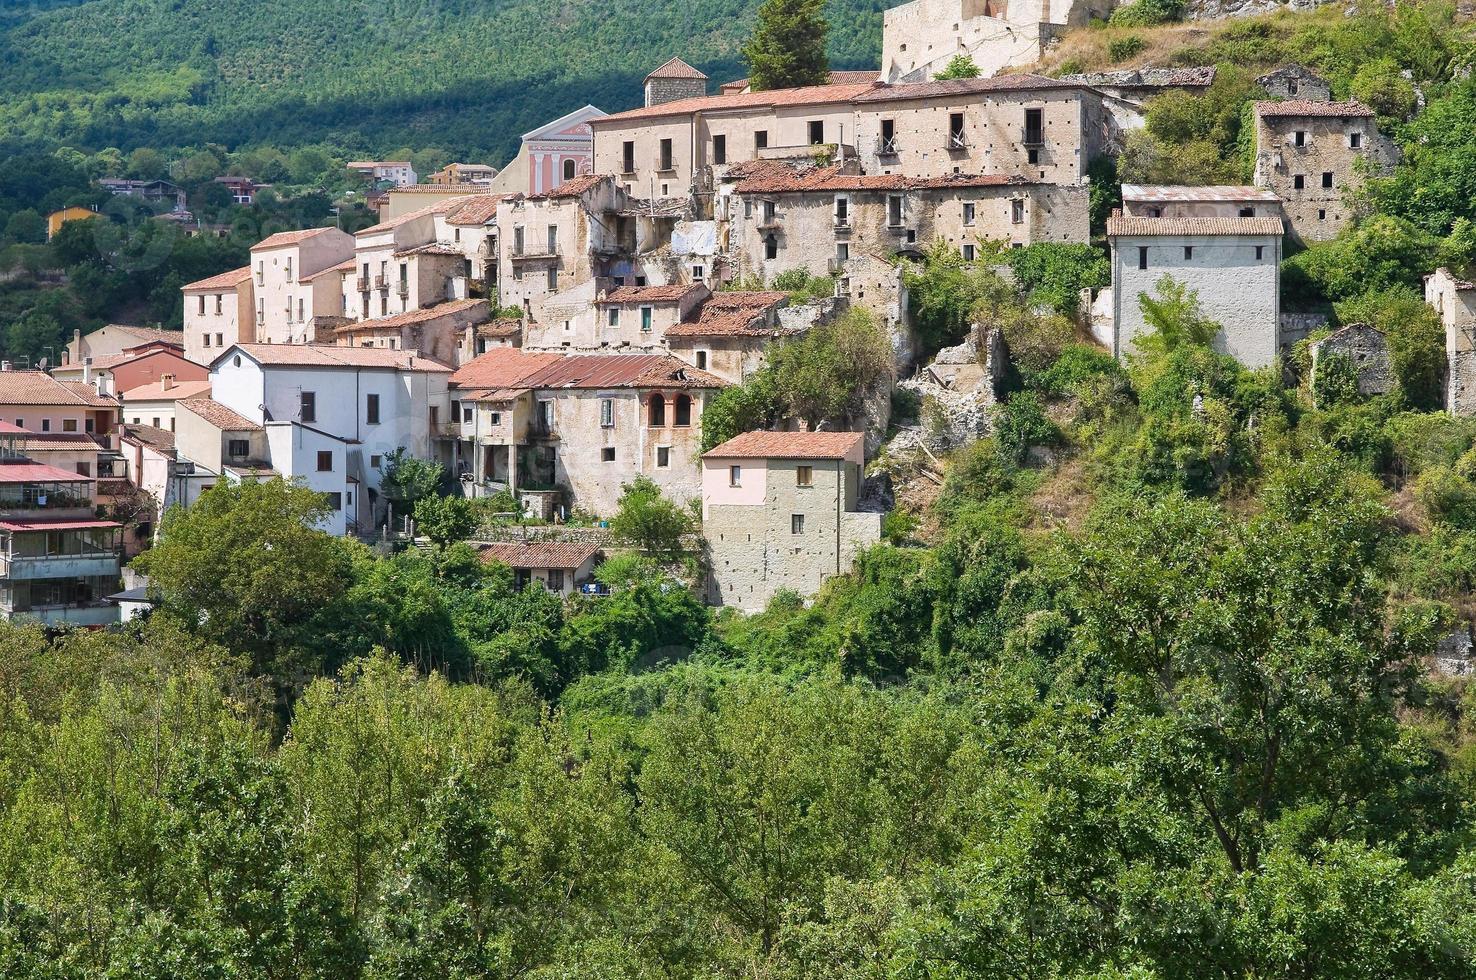 panoramautsikt över Brienza. basilicata. Italien. foto